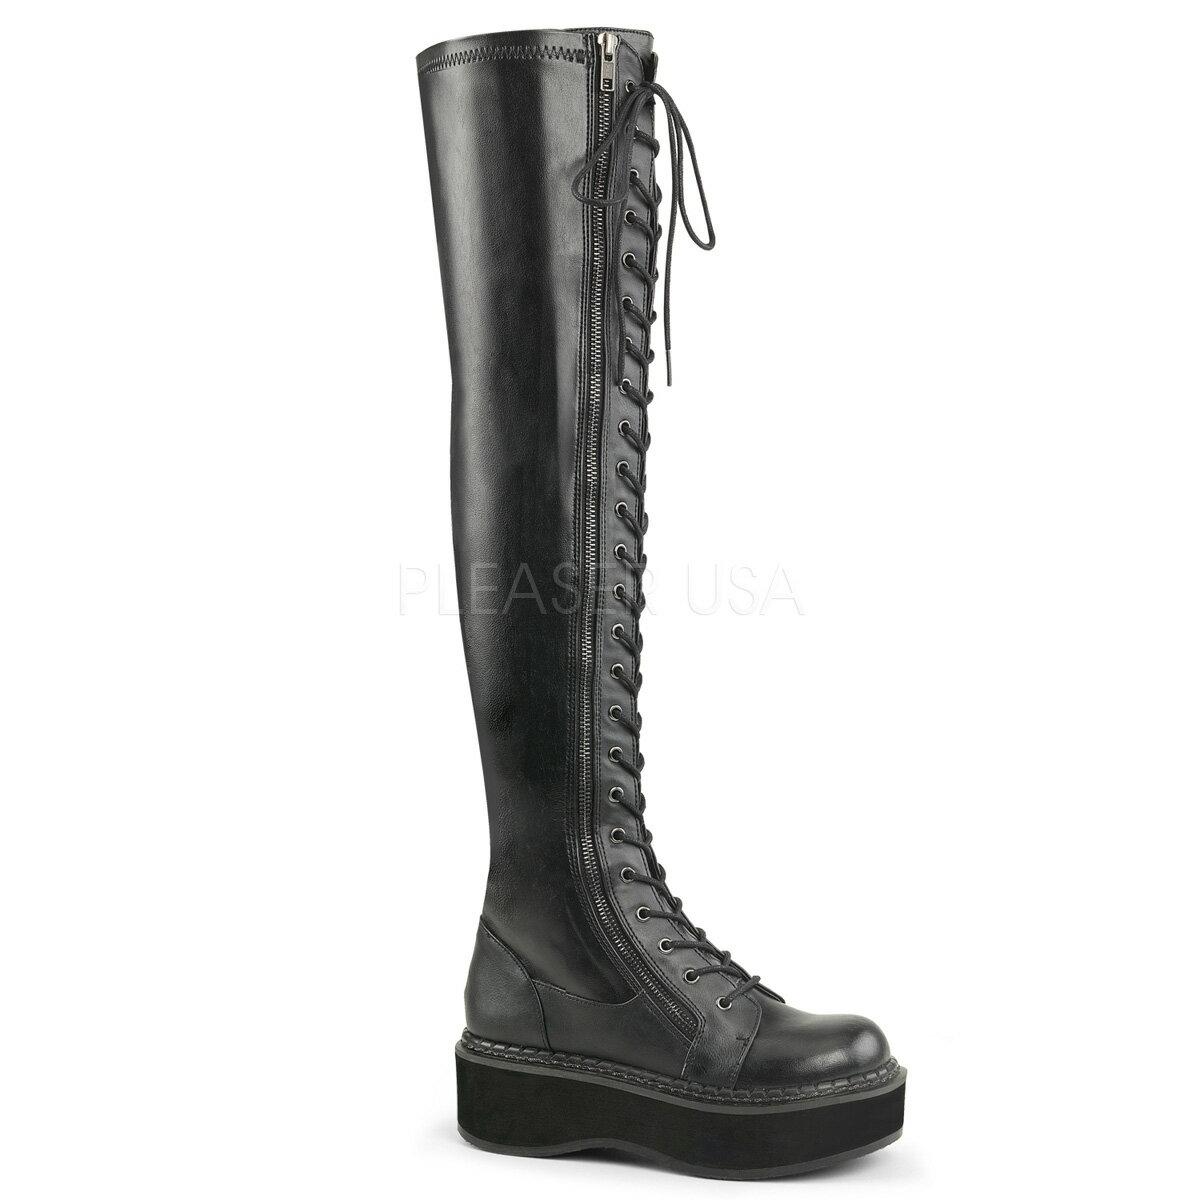 DEMONIA【取り寄せ】デモニア・レースアップサイハイブーツ/品番:EMILY-375/EMI375/5cmソール/ゴシック/原宿系/フェティッシュ/厚底靴/厚底シューズ/大きいサイズ/靴/フェイクレザーブラック/黒